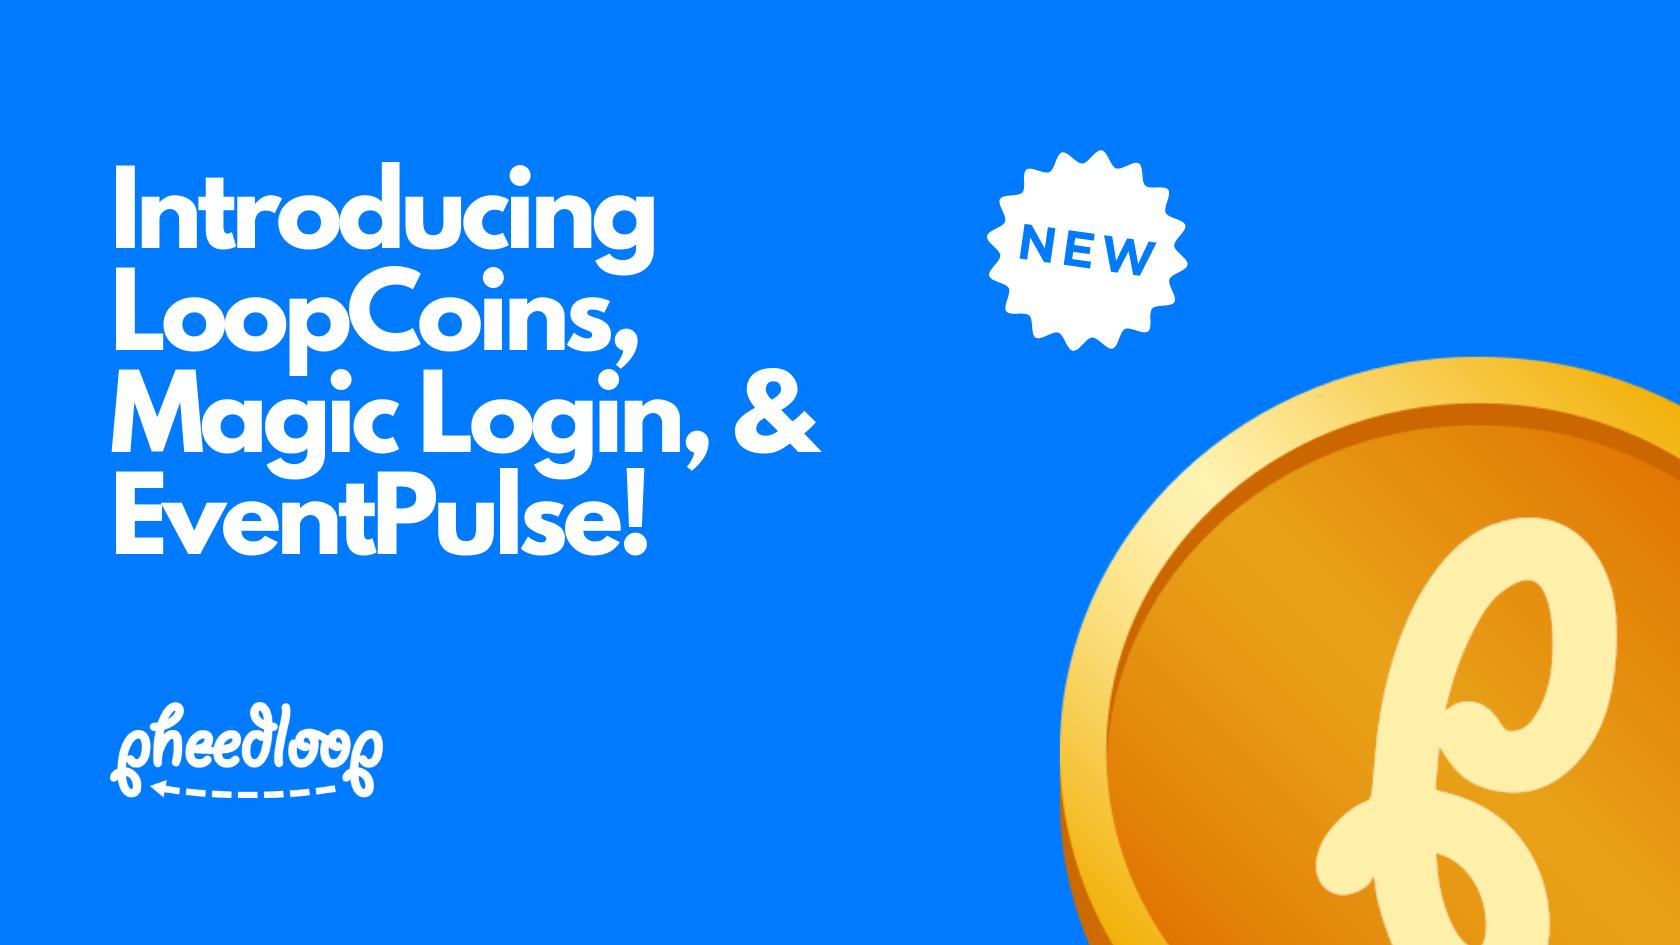 Introducing LoopCoins, Magic Login, and EventPulse (New Dashboard Metrics)!